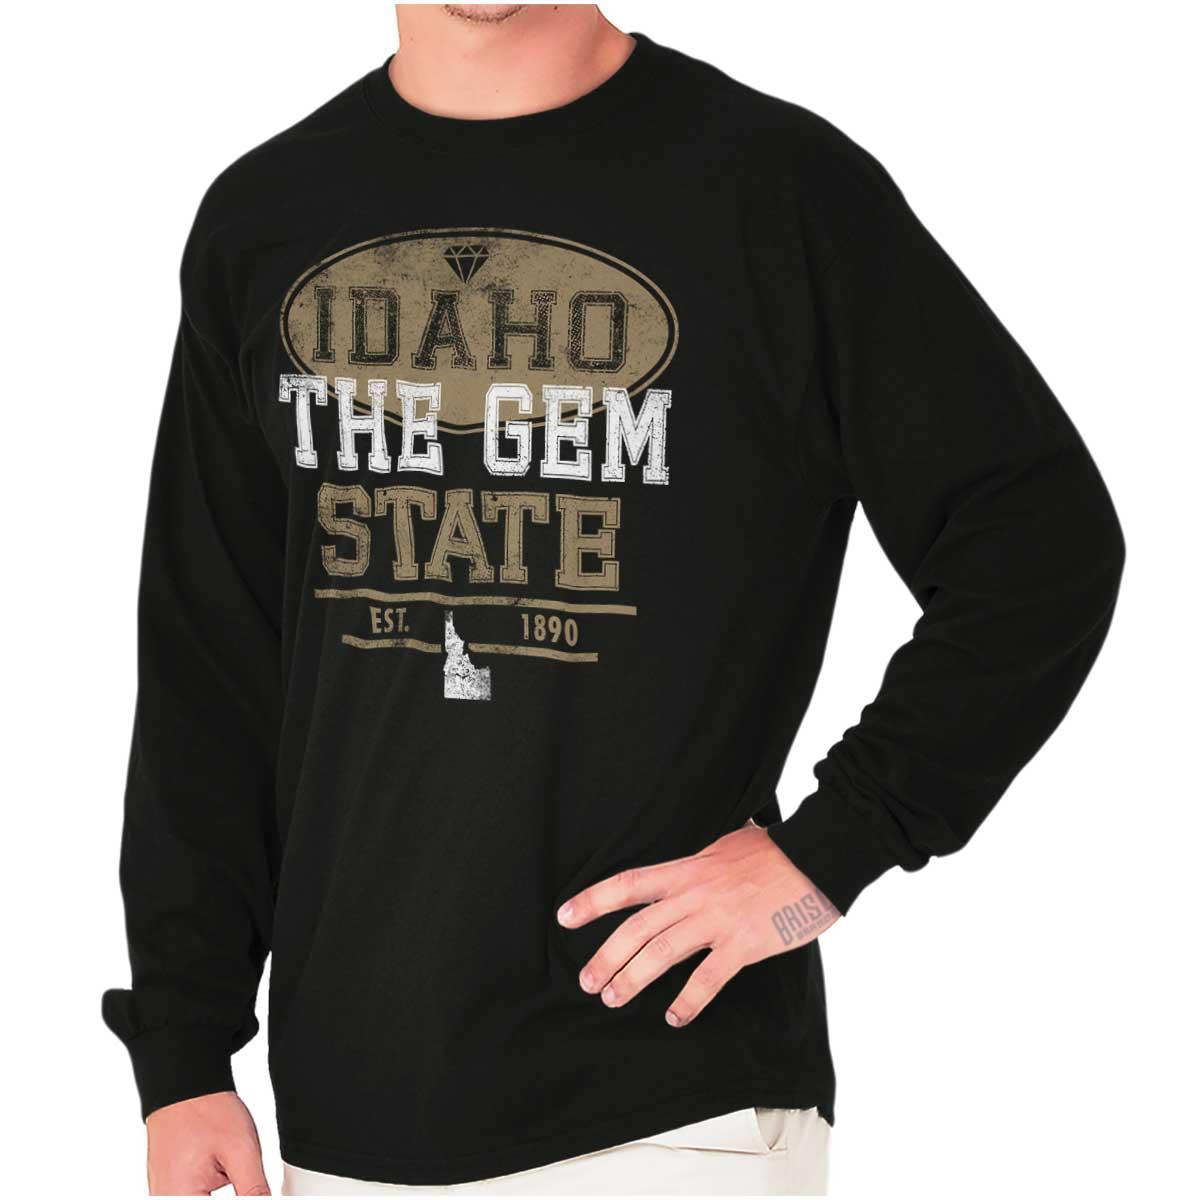 Ohio The Buckeye State USA University Sports Short Sleeve T-Shirt Tees Tshirts